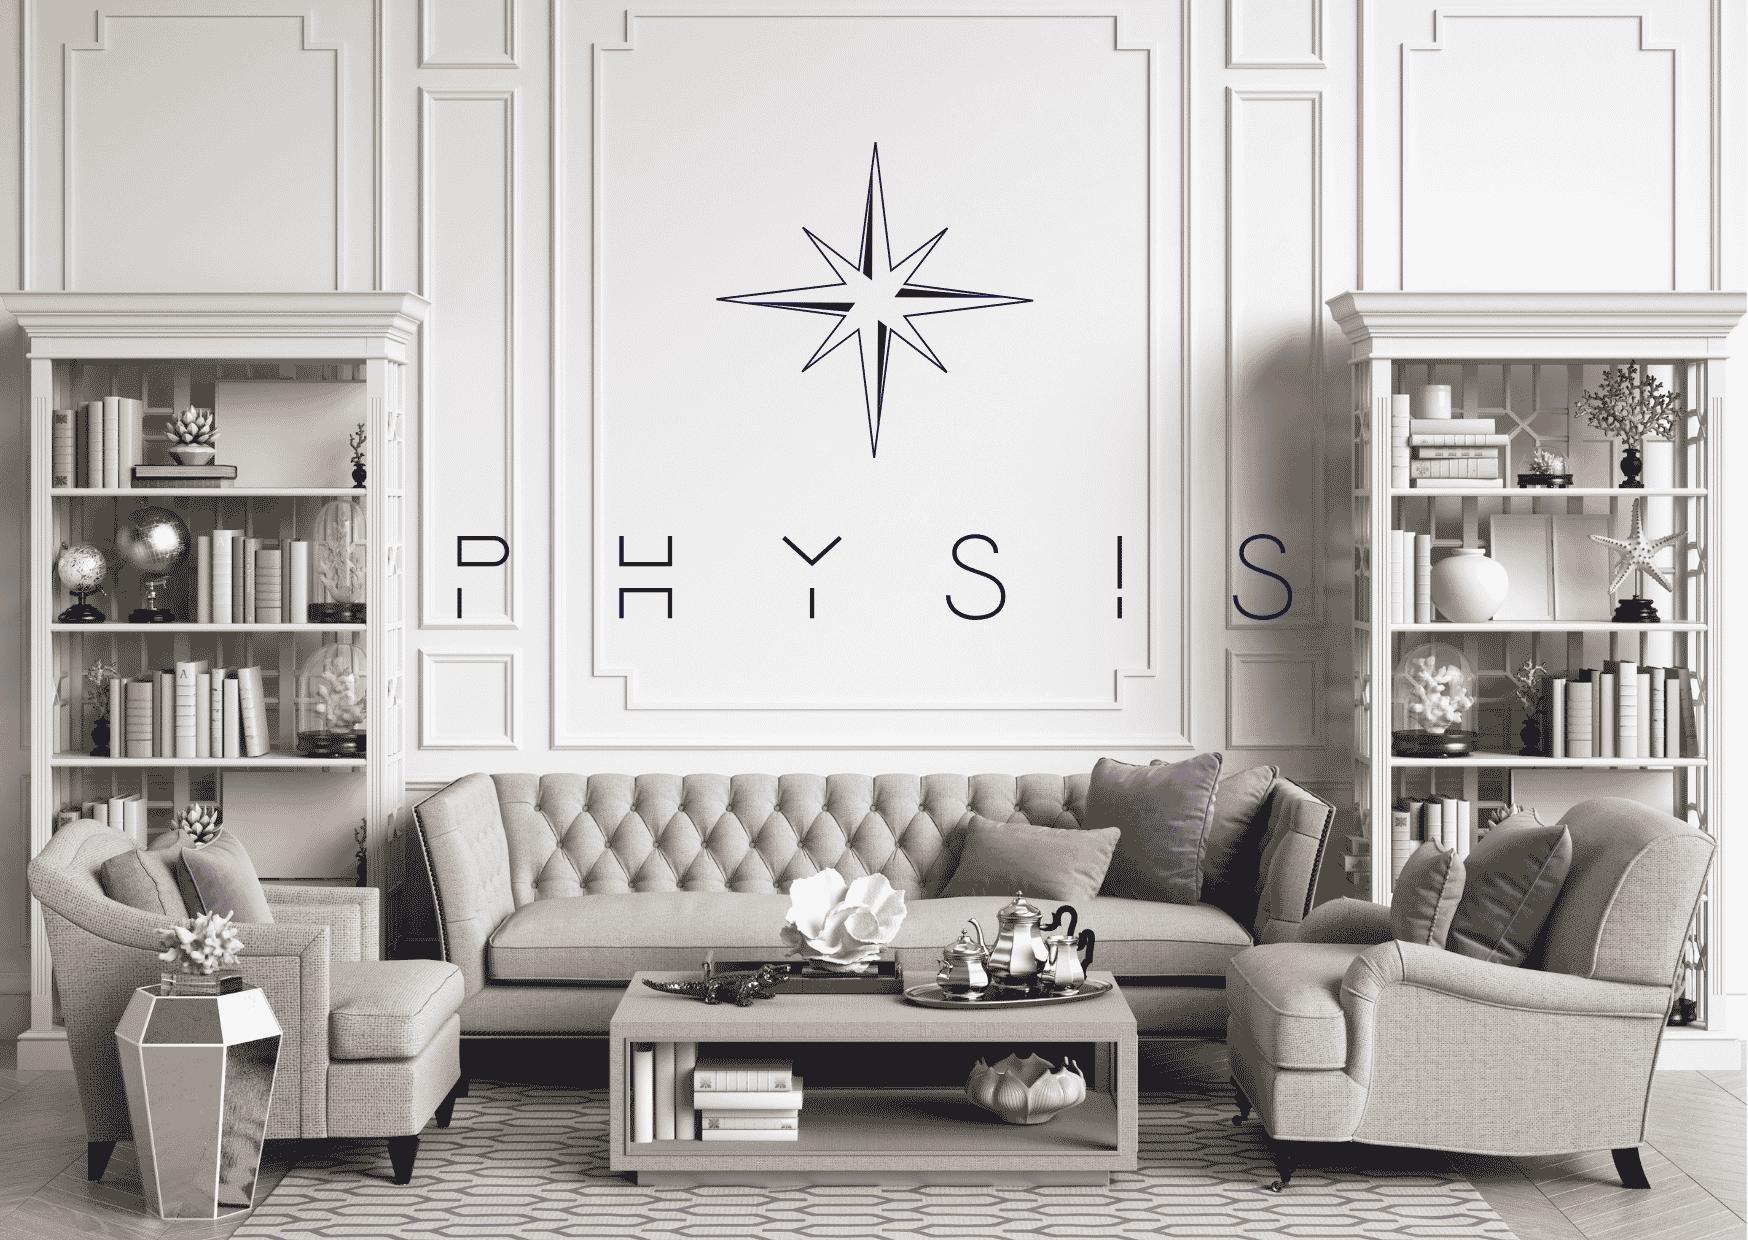 Physis Retreats